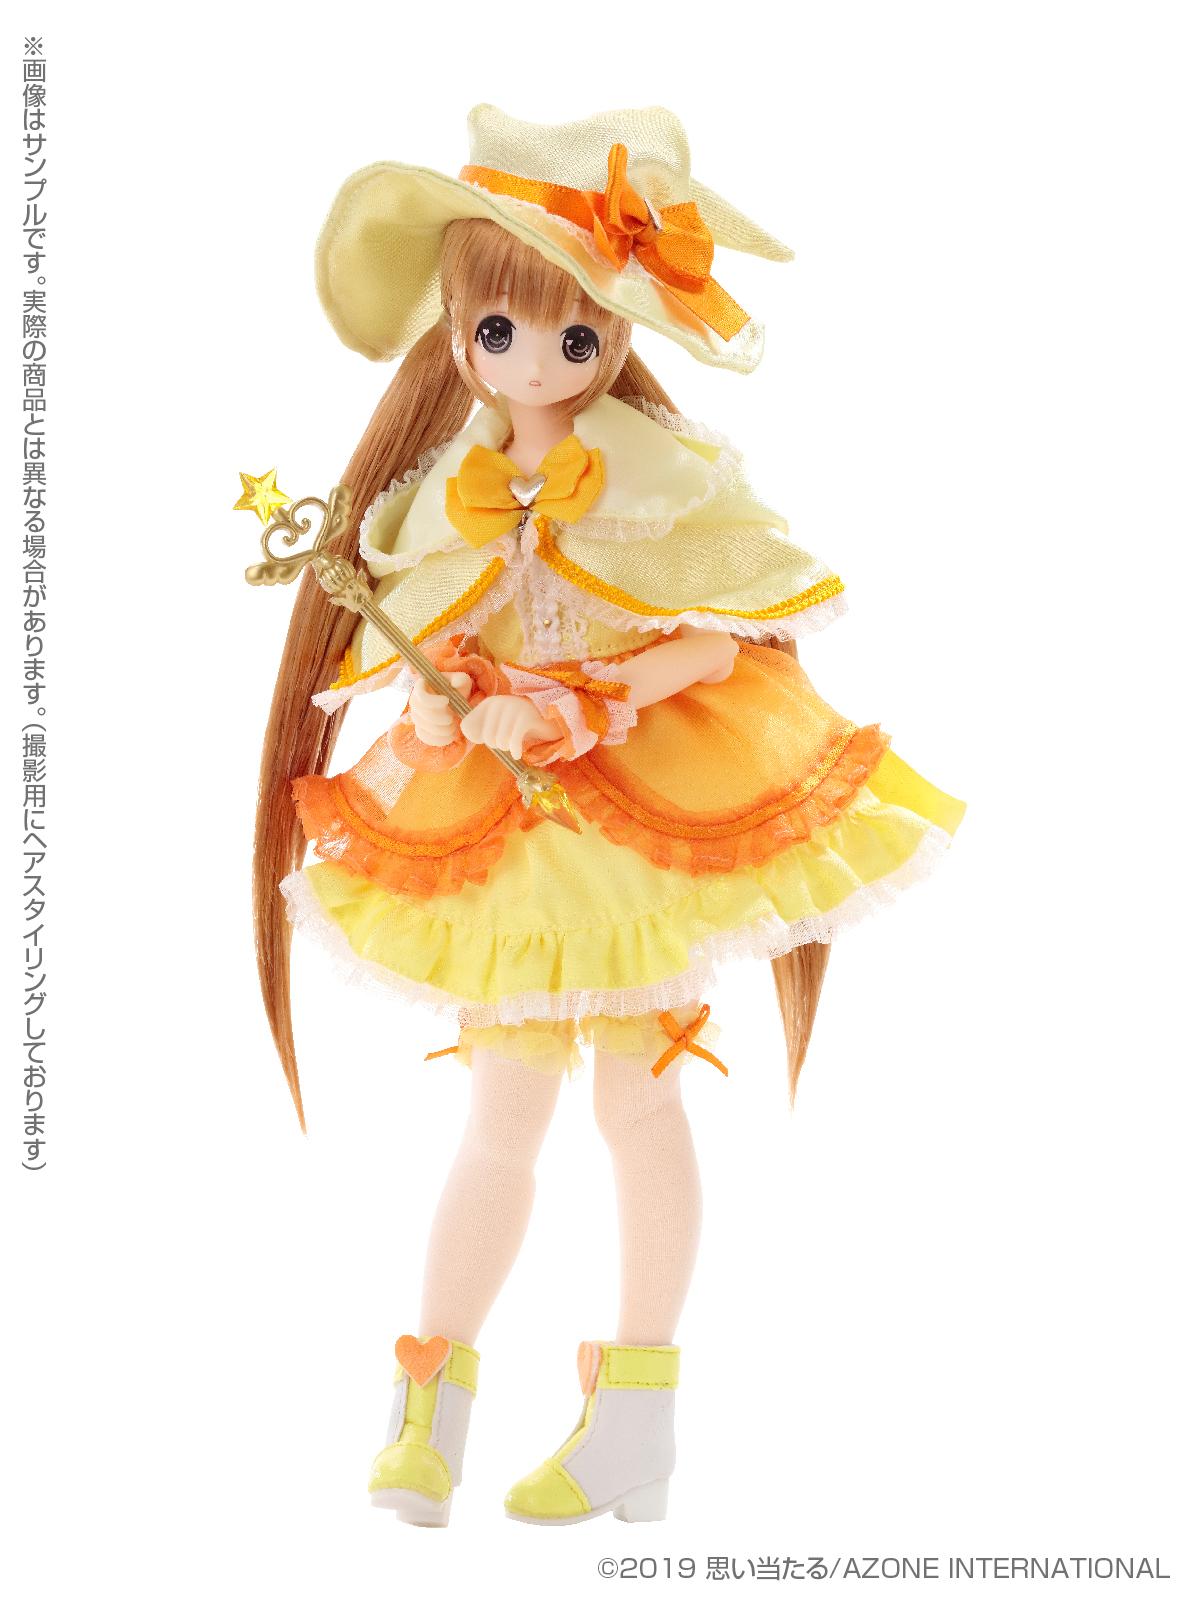 Magical☆CUTE『Pure Heart Chiika(ピュアハート ちいか)』えっくす☆きゅーと 1/6 完成品ドール-002